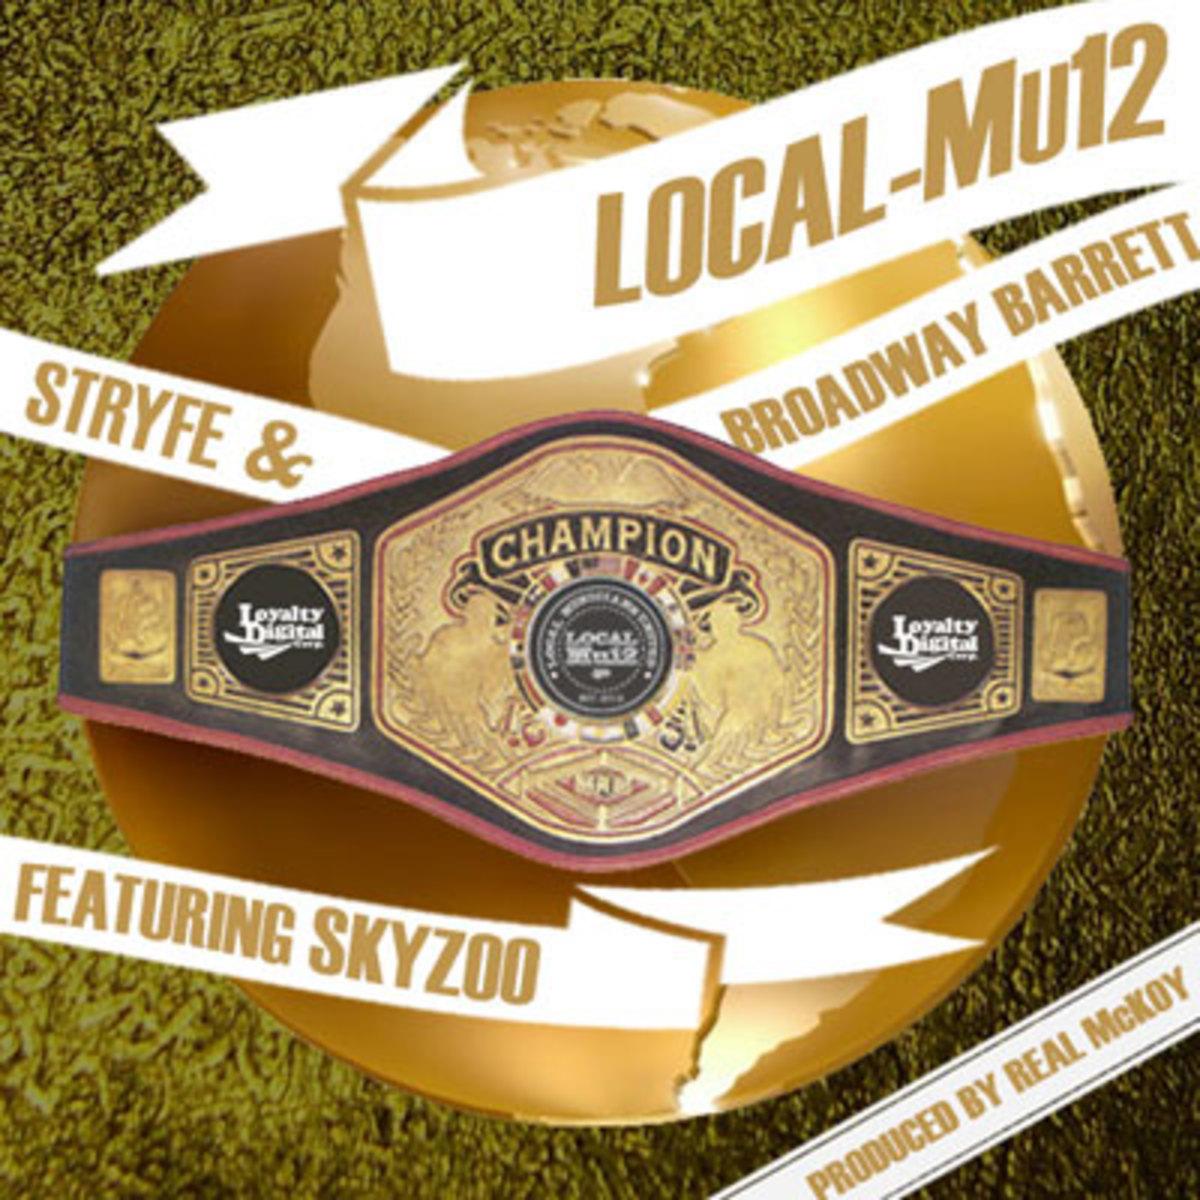 localmu12-champion.jpg